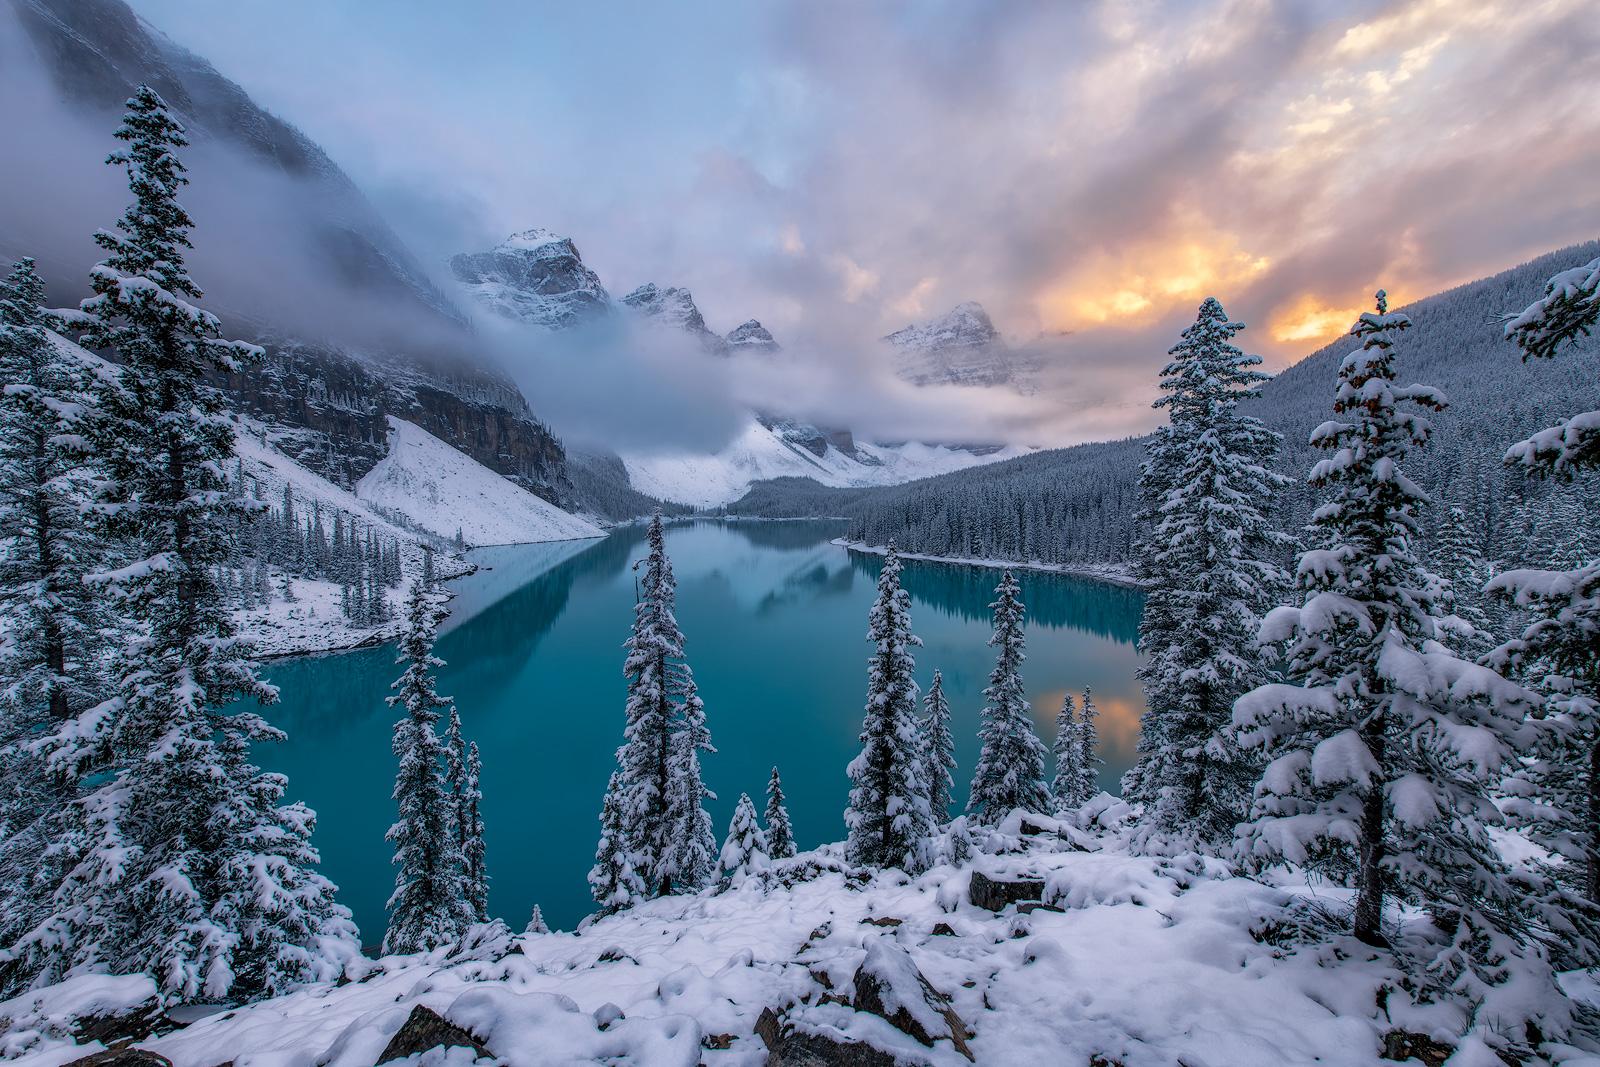 Canada, Glacier, Alberta, Banff, Moraine Lake, Canadian Rockies, Lake Louise, Jasper National Park, Rocky Mountains, Lake Minnewanka, Icefields Parkway, Banff National Park, photo